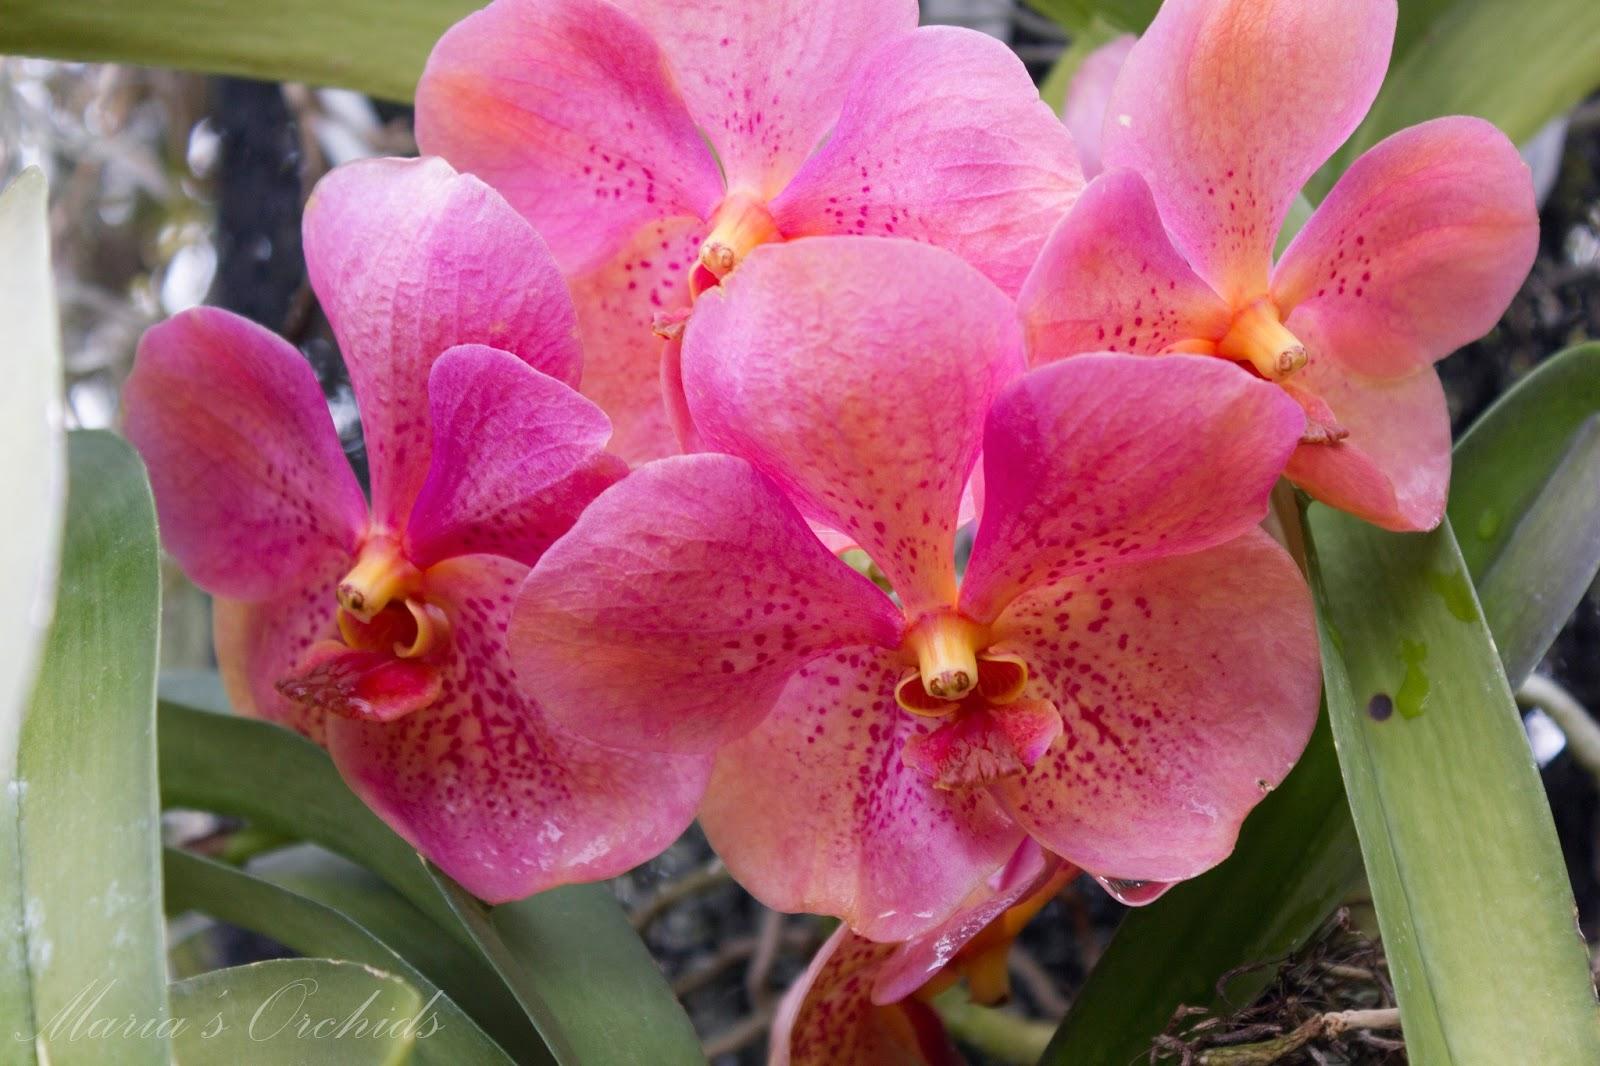 Maria S Orchids New York Orchid Show 2013 Vandas